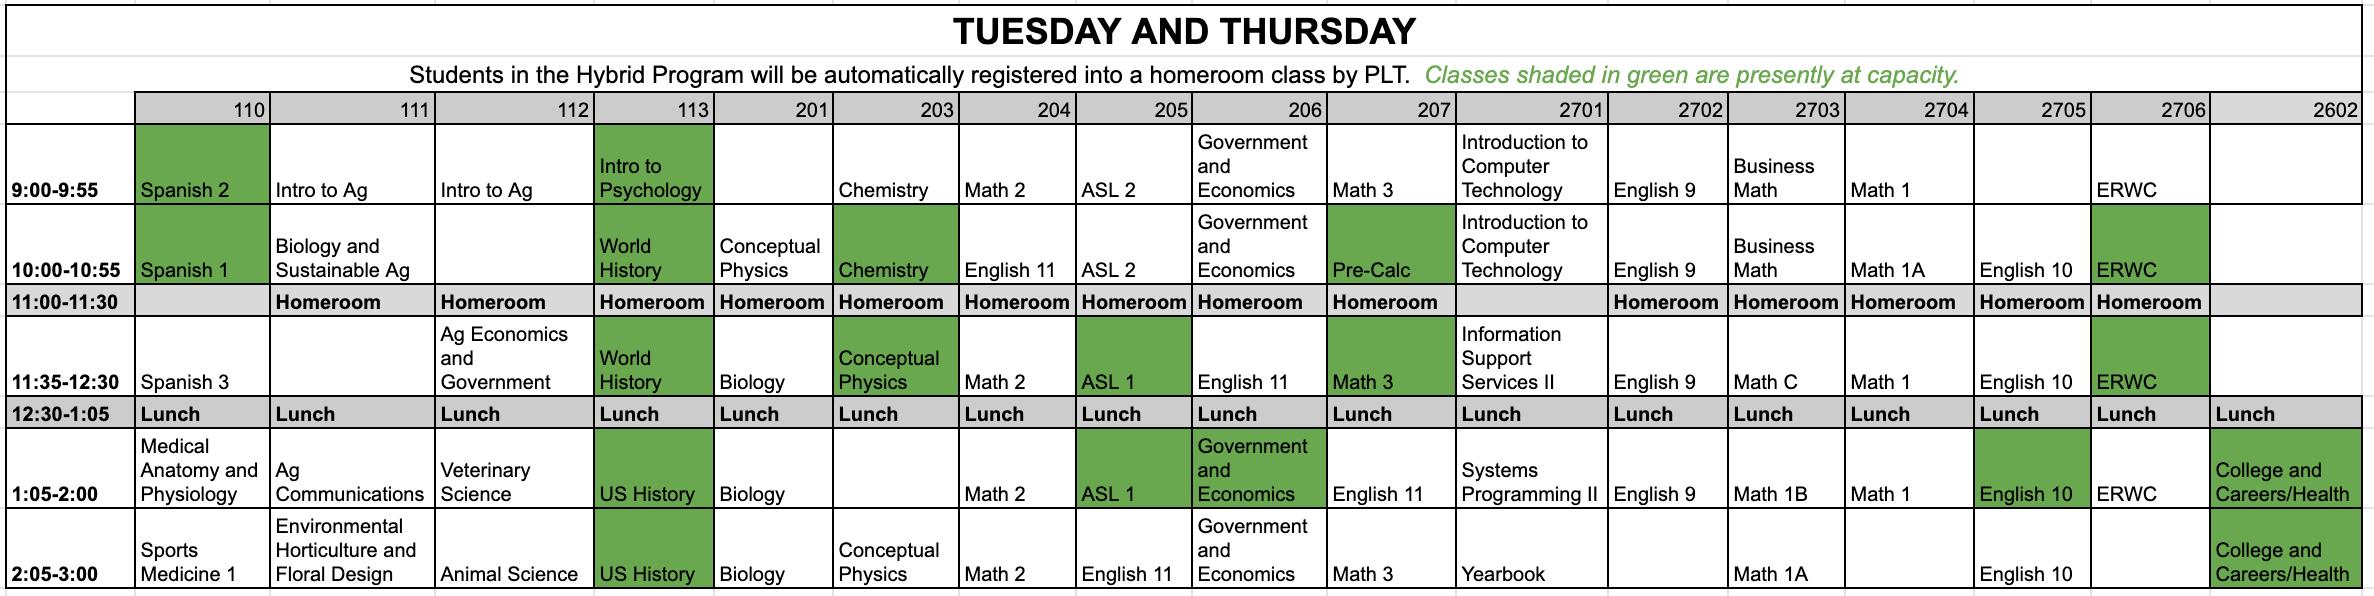 Tuesday and Thursday